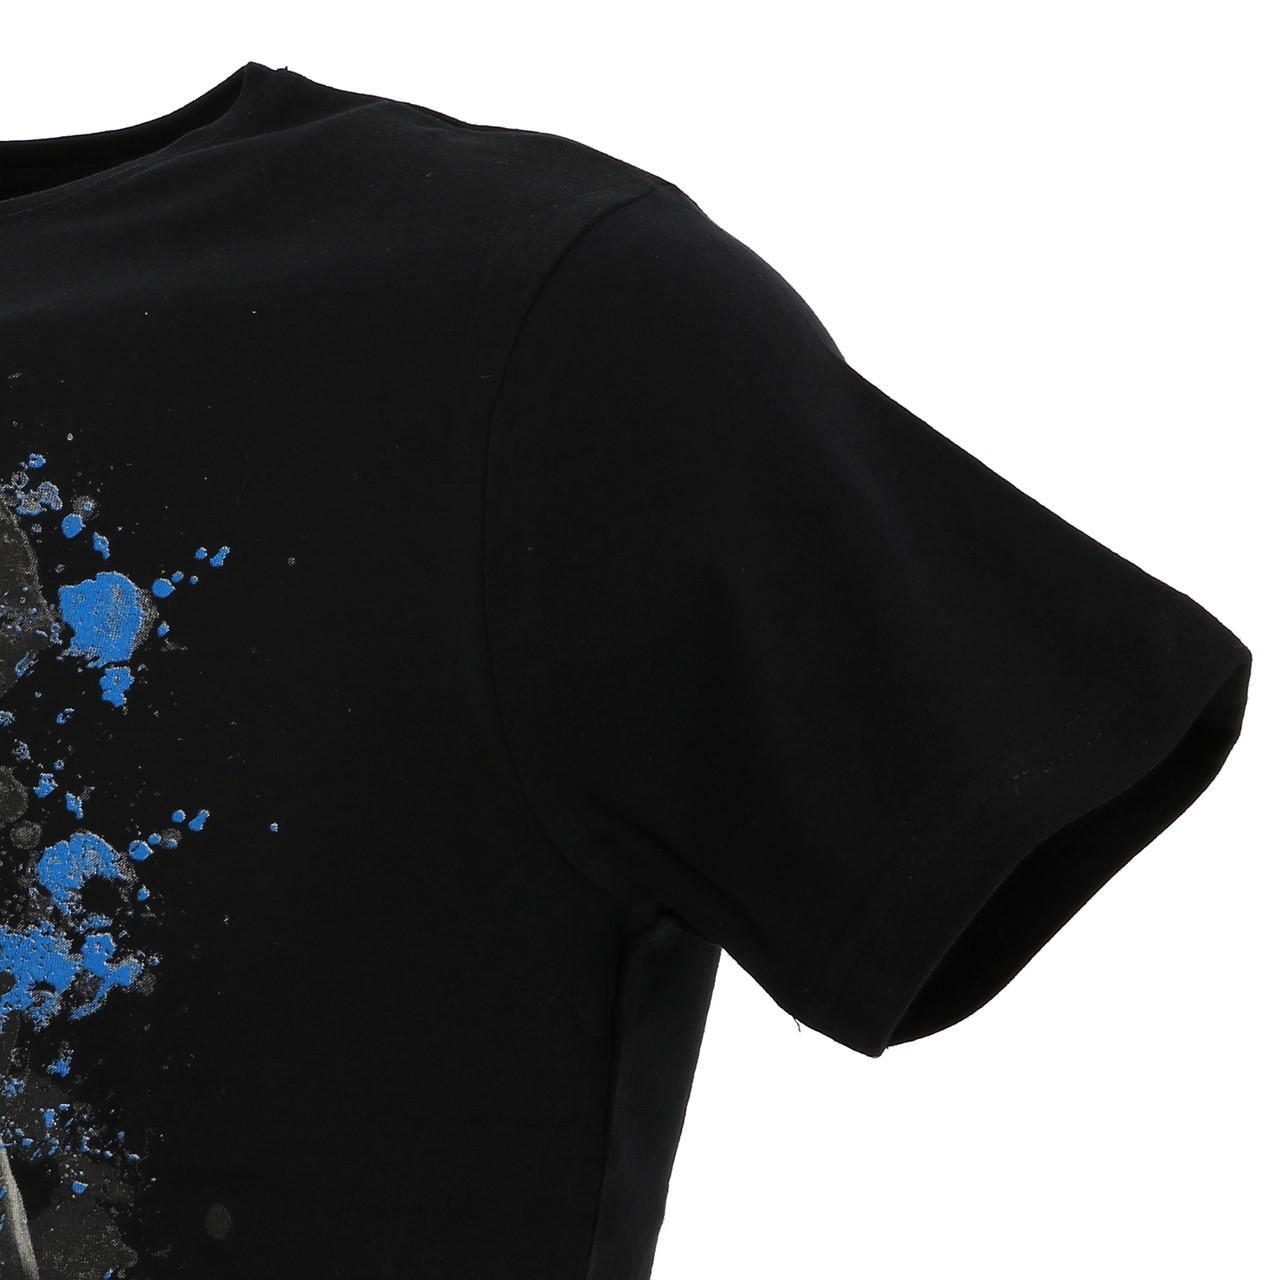 Short-Sleeve-T-Shirt-Paname-Brothers-Merico-Black-Mc-Tee-Black-26749-New thumbnail 3